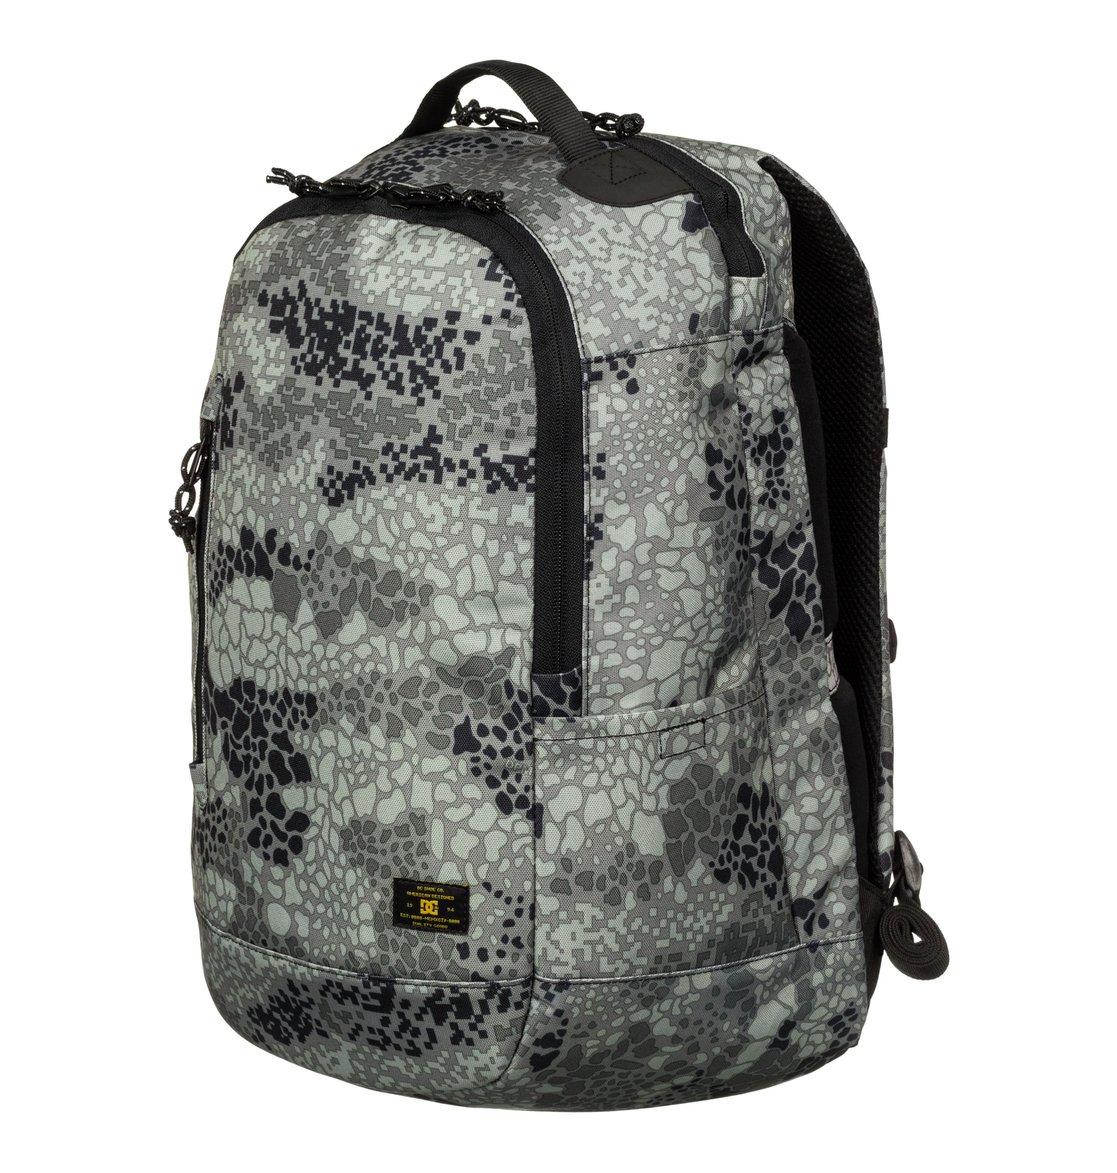 f7c14abf2b9 1 Trekker DPM - Backpack EDYBP03059 DC Shoes